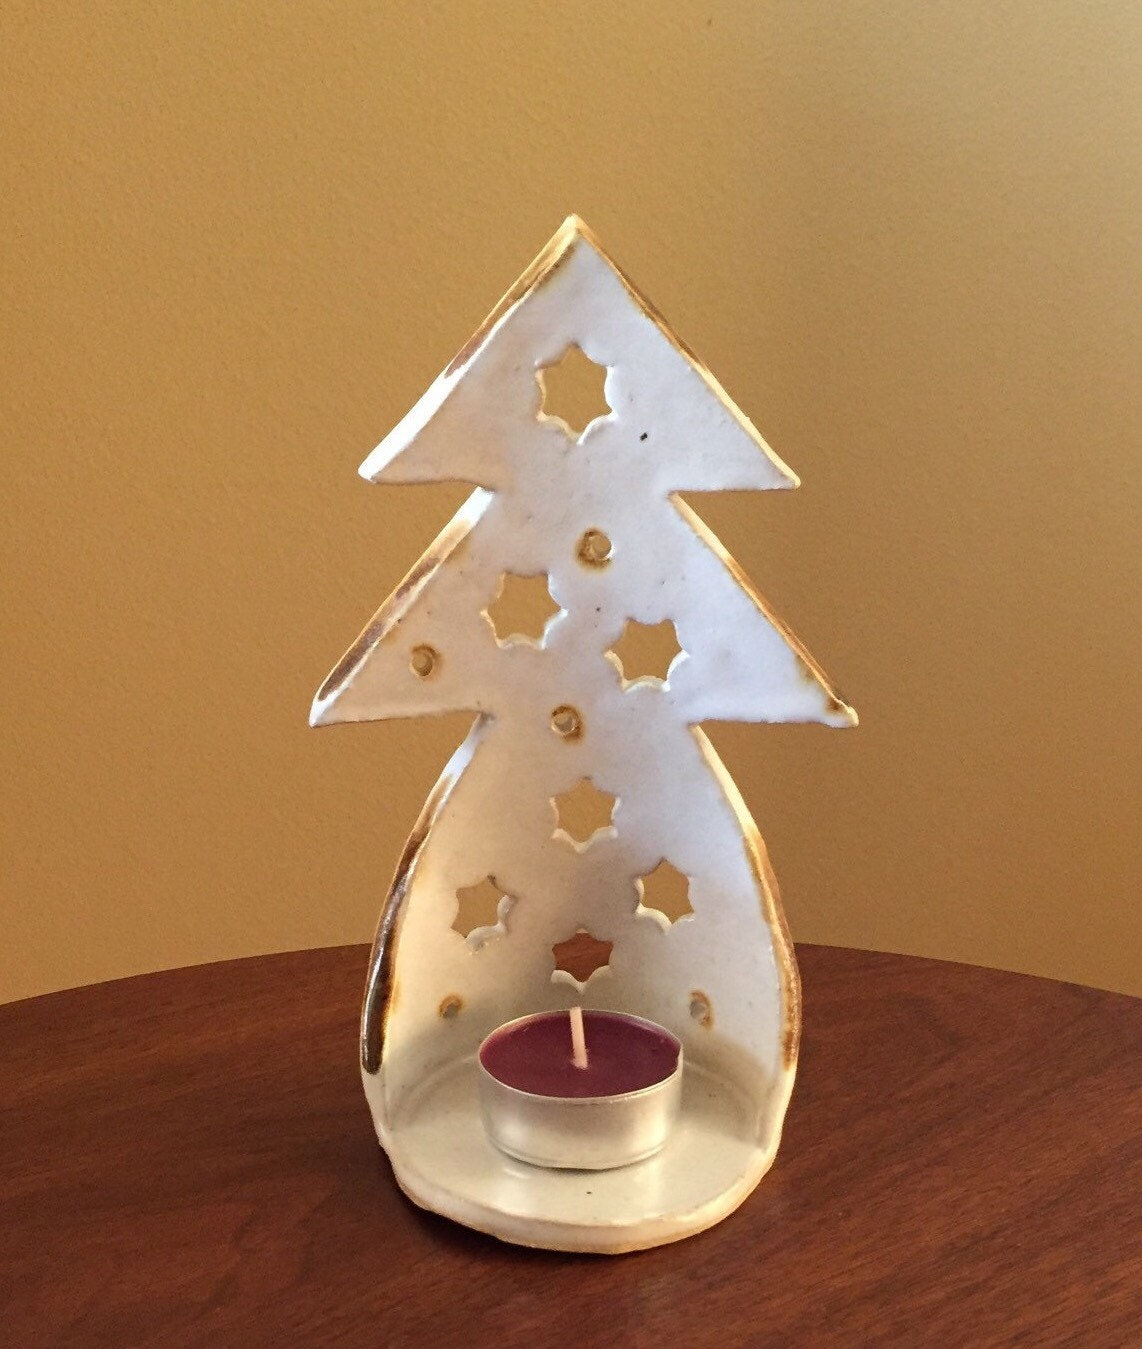 Luminary Majestic Tree Candle Holder